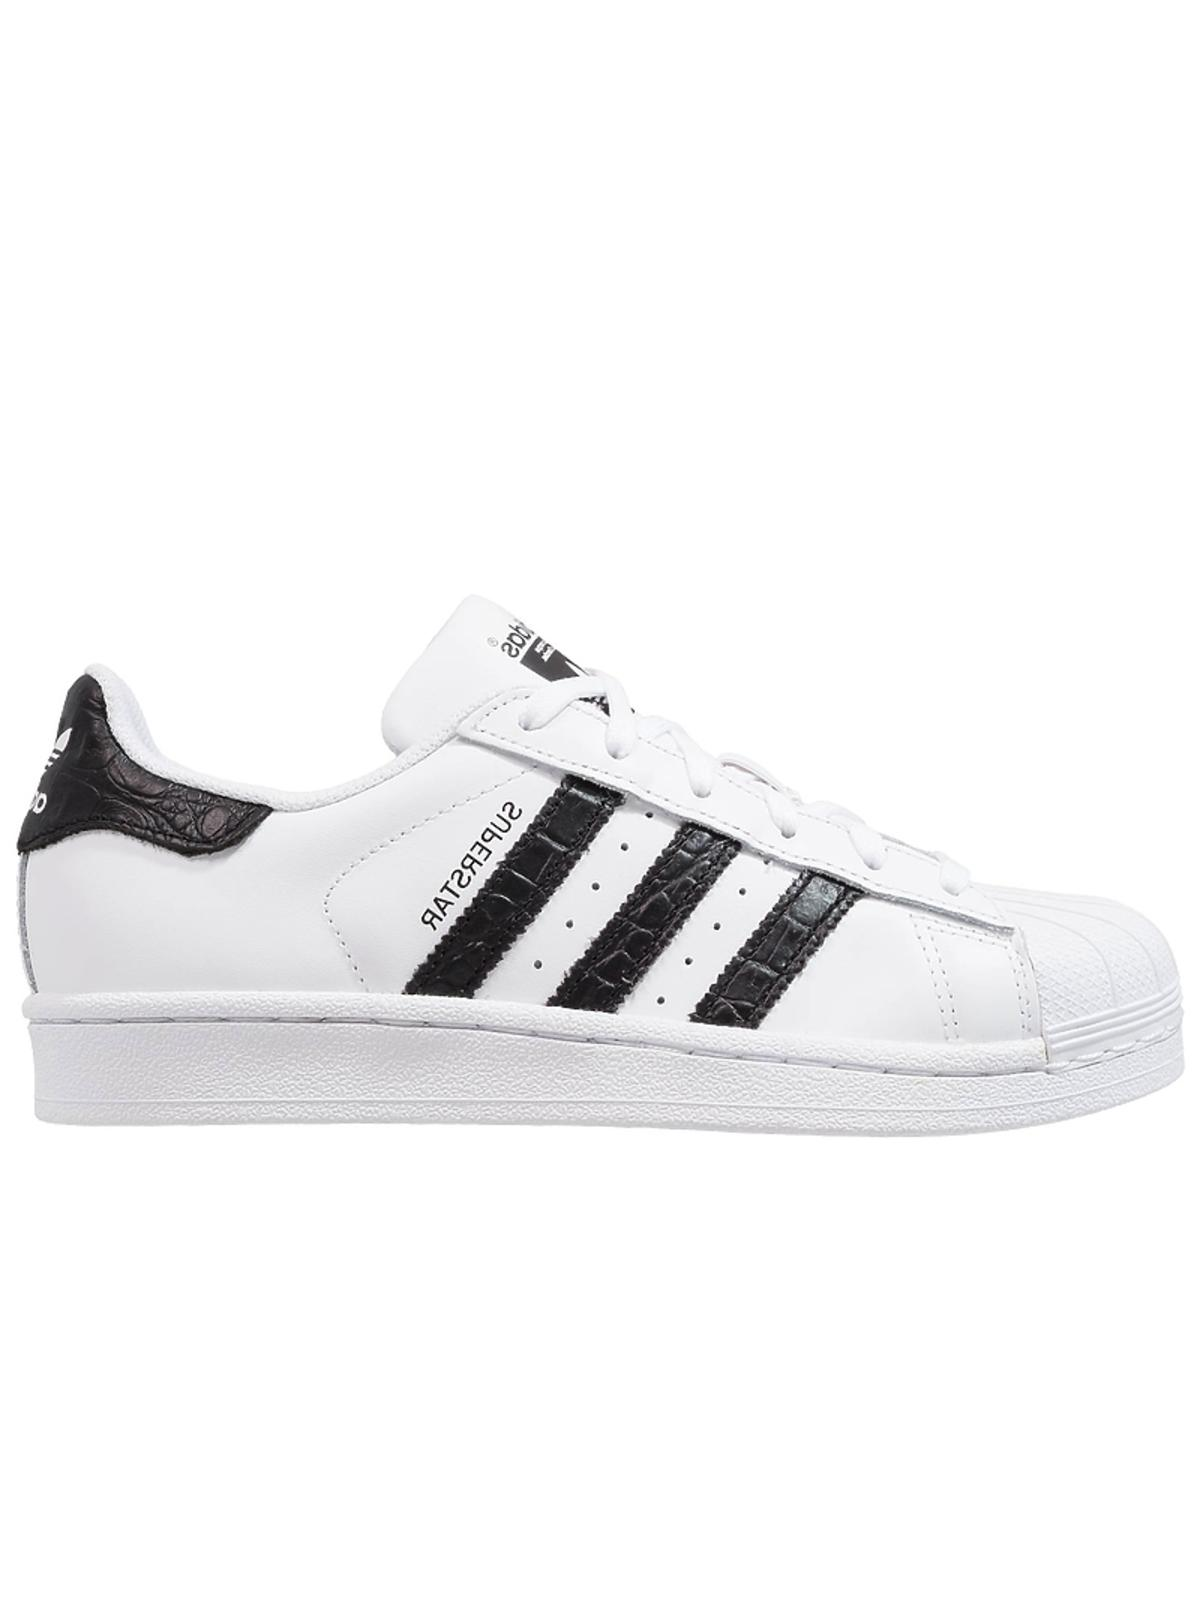 Adidas Superstar, 269,10 zł / Zalando